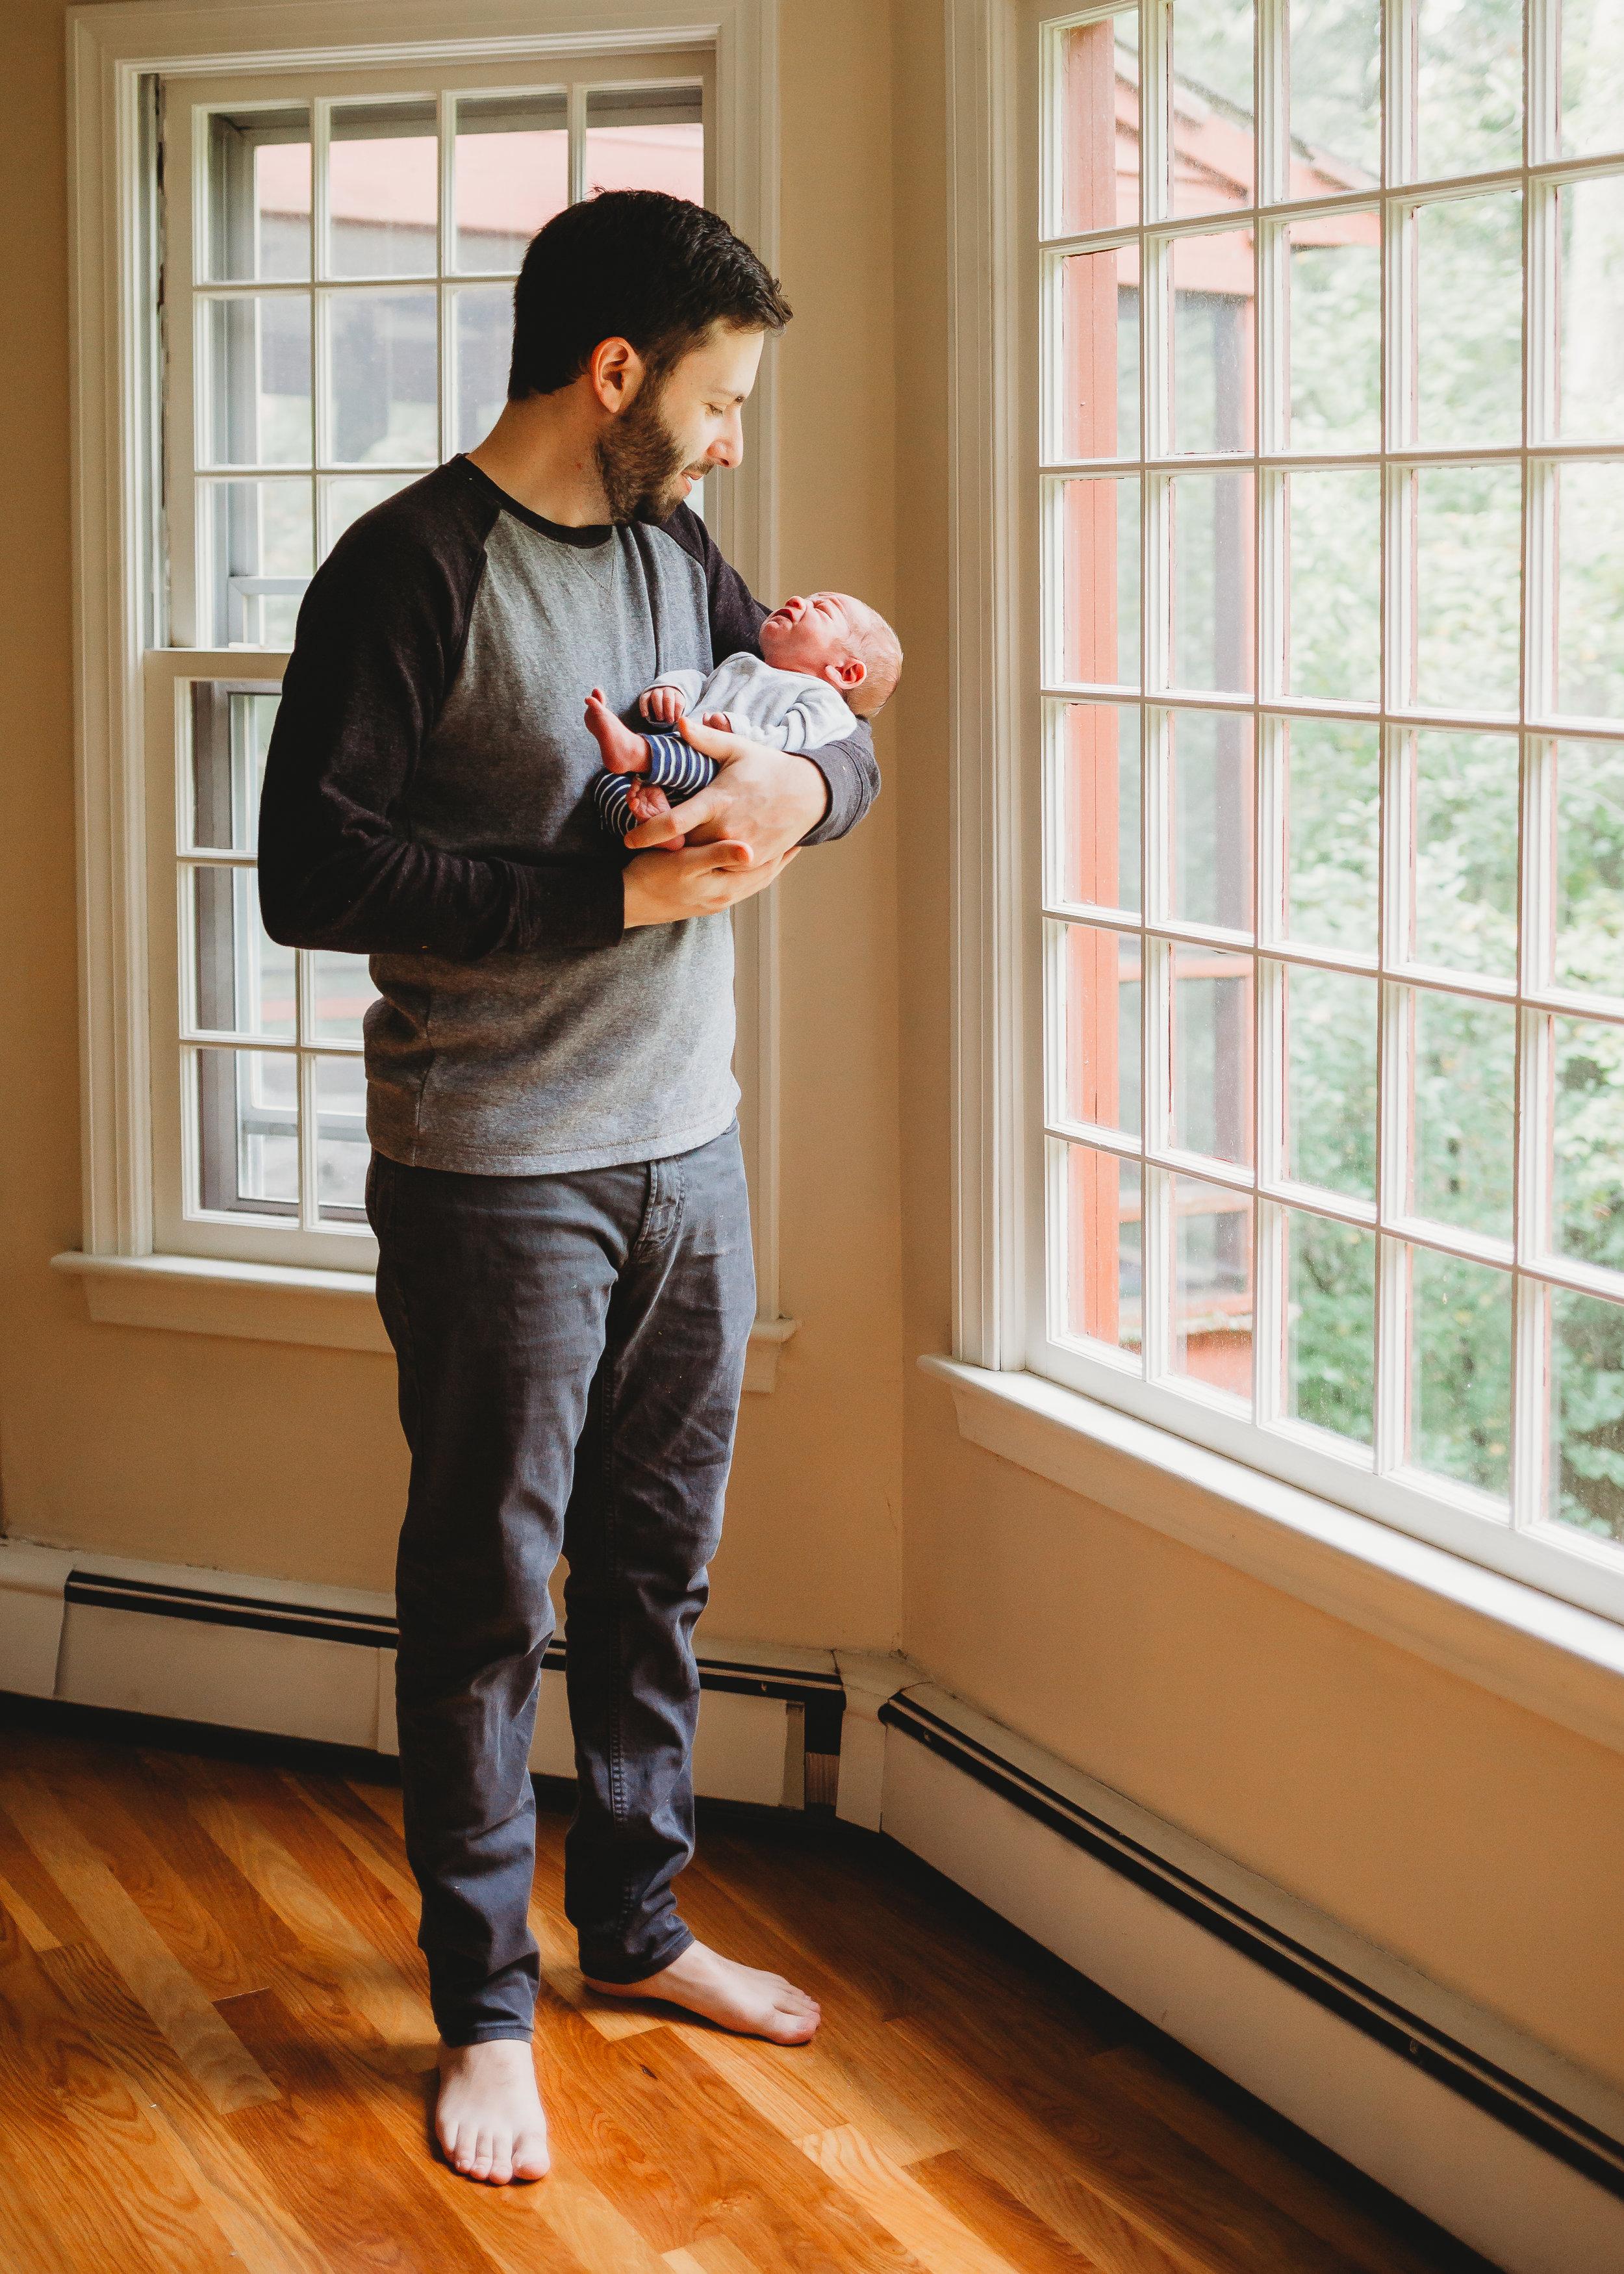 Dad holding newborn near windows. Sudbury newborn photography / Boston family photographer / natural light / lifestyle